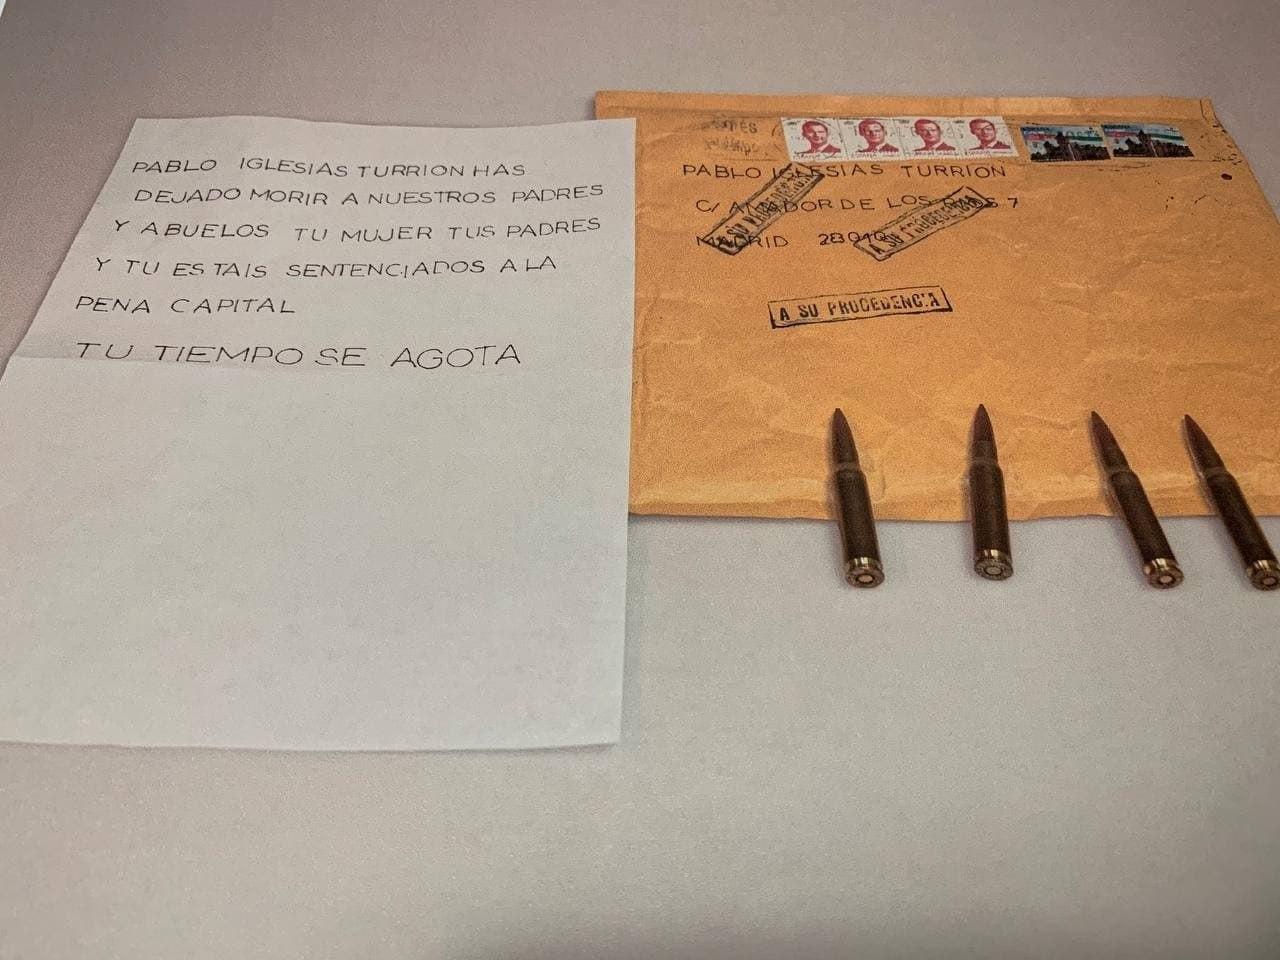 Carta recibida por Pablo Iglesias.